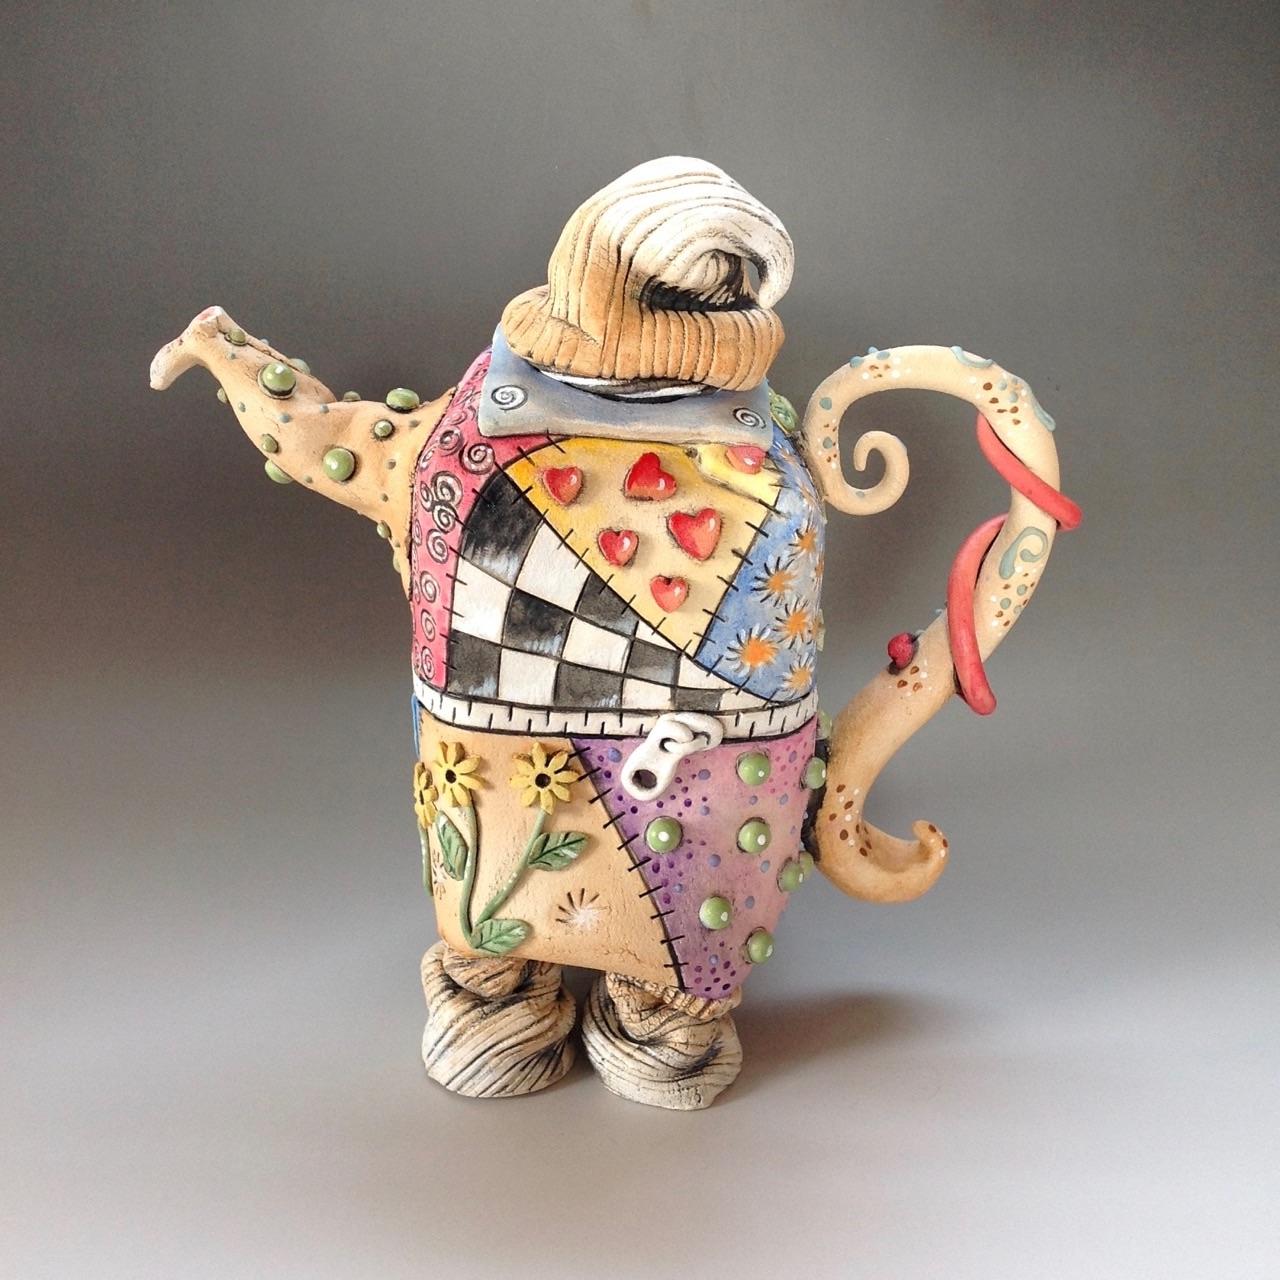 Patchwork Tea Pot Ceramic Pottery